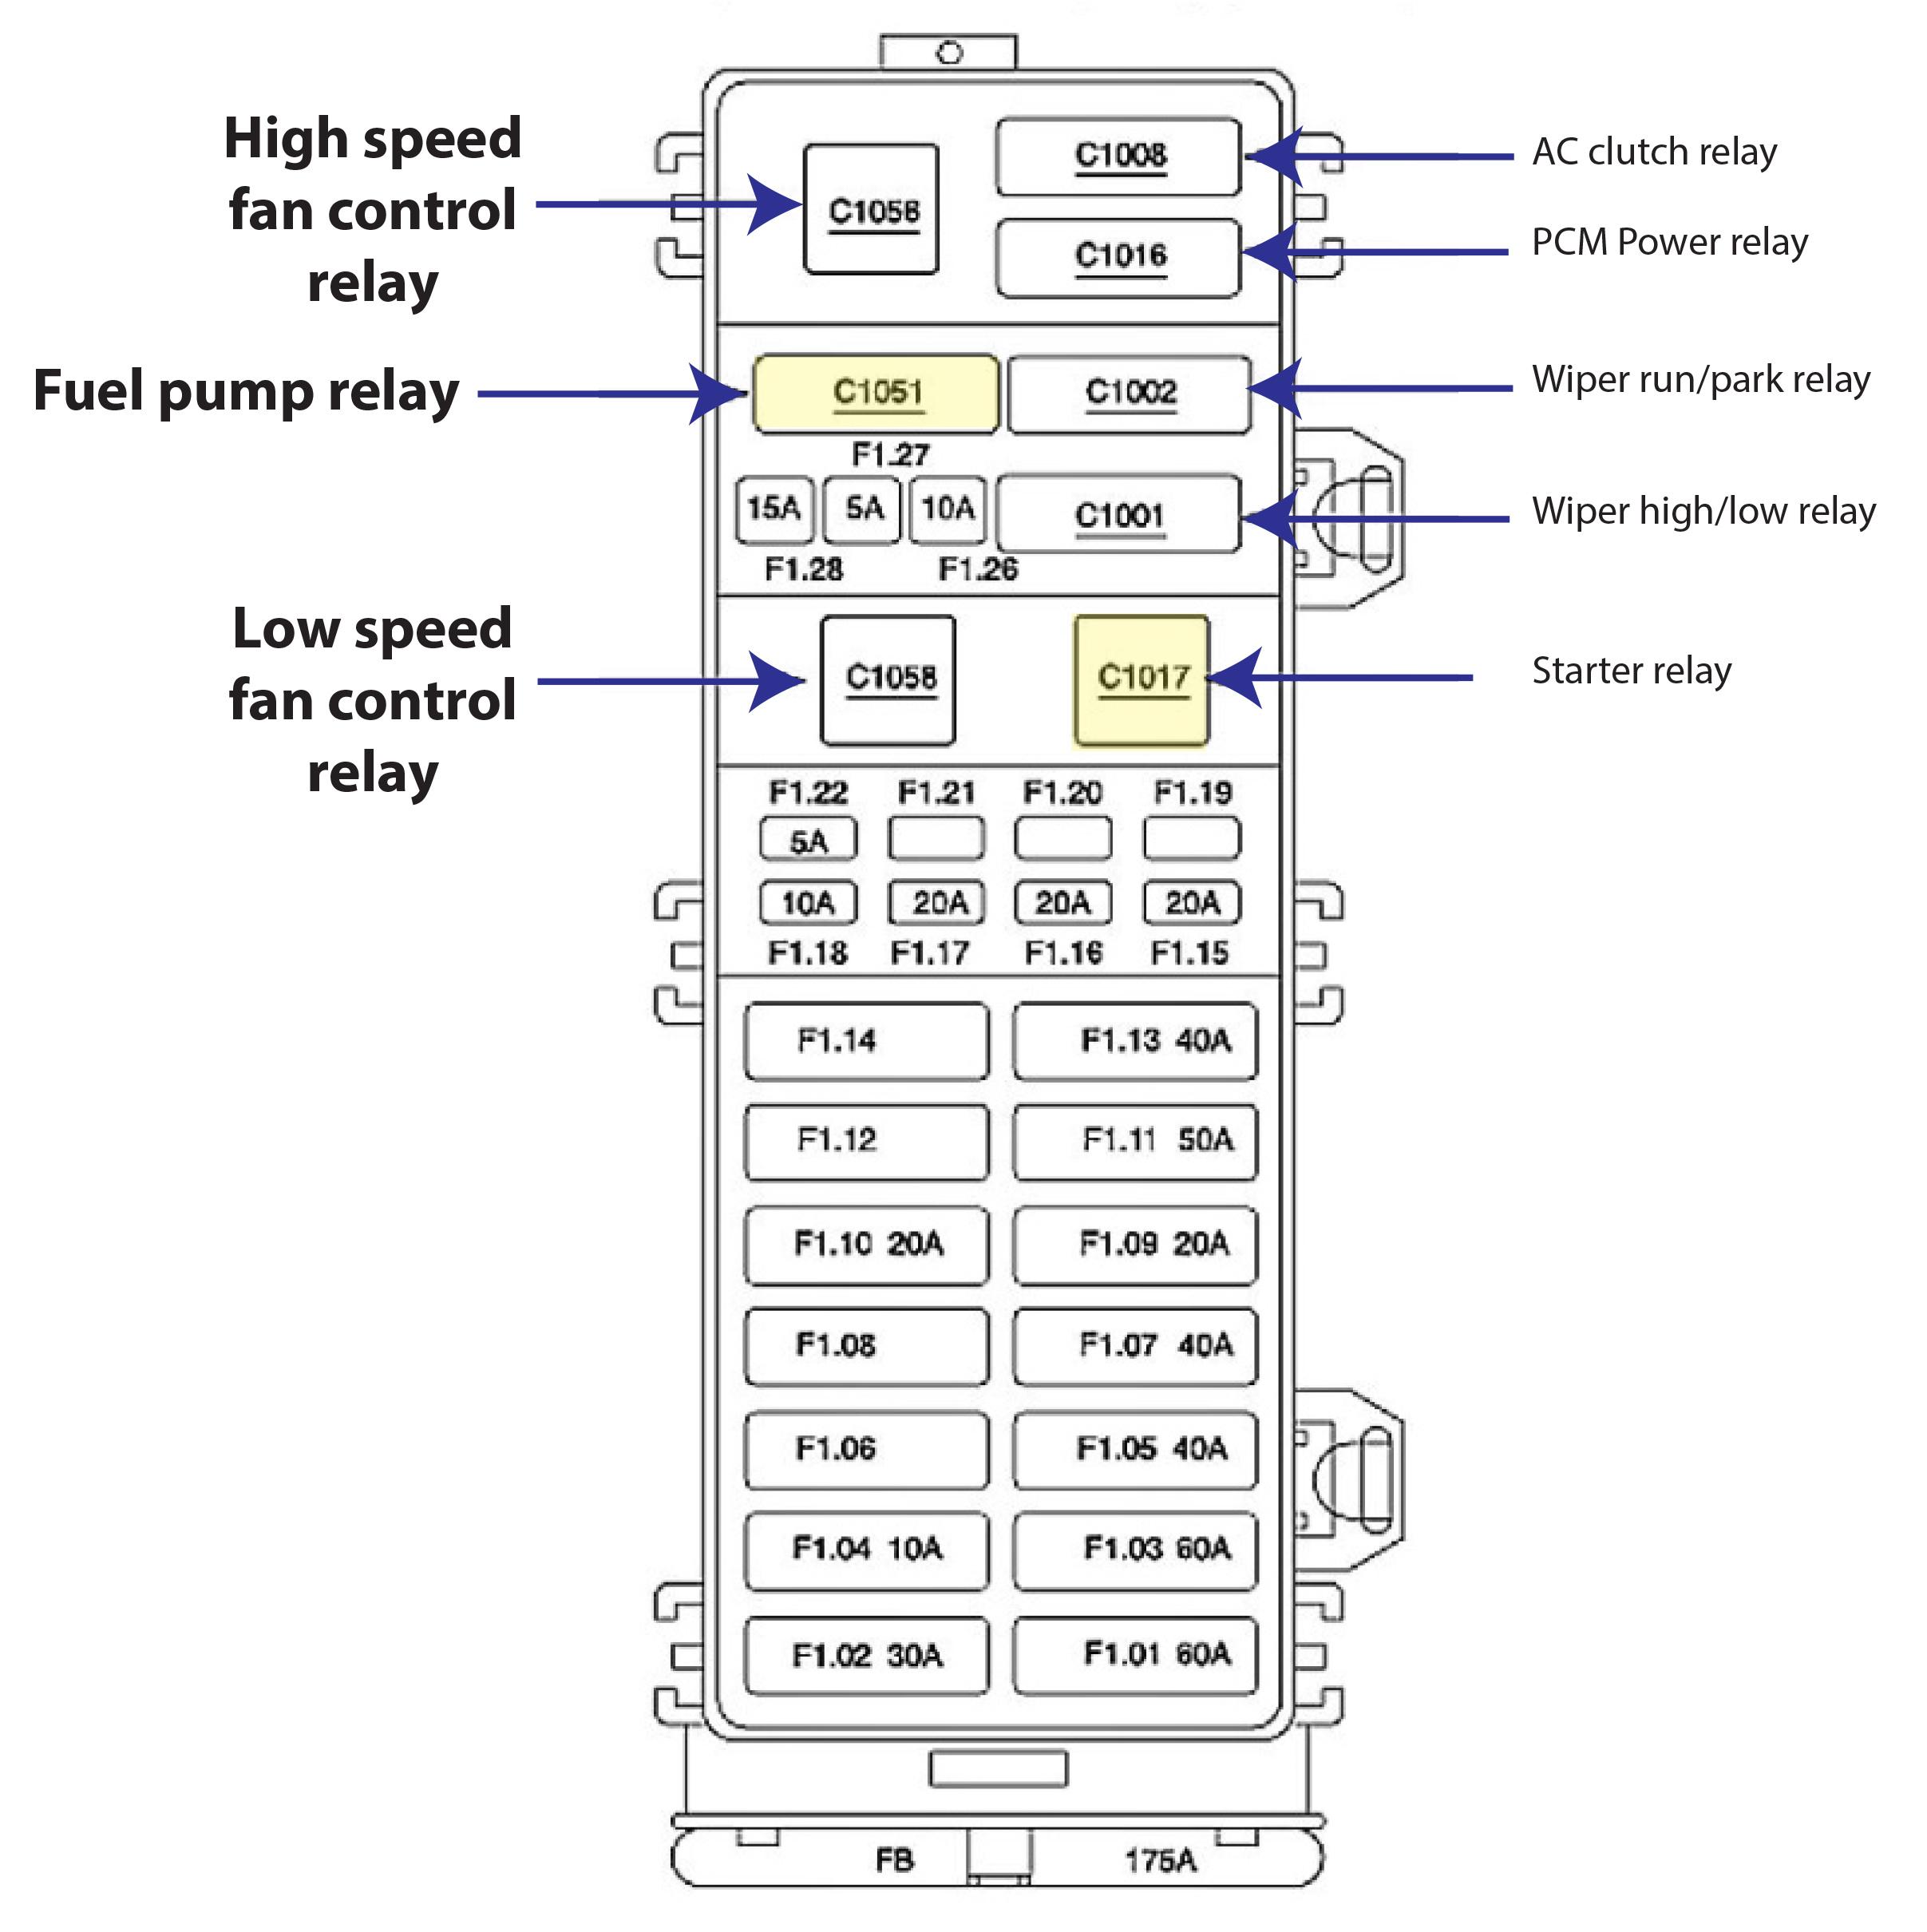 06 Tundra Keyless Entry Wiring Diagram